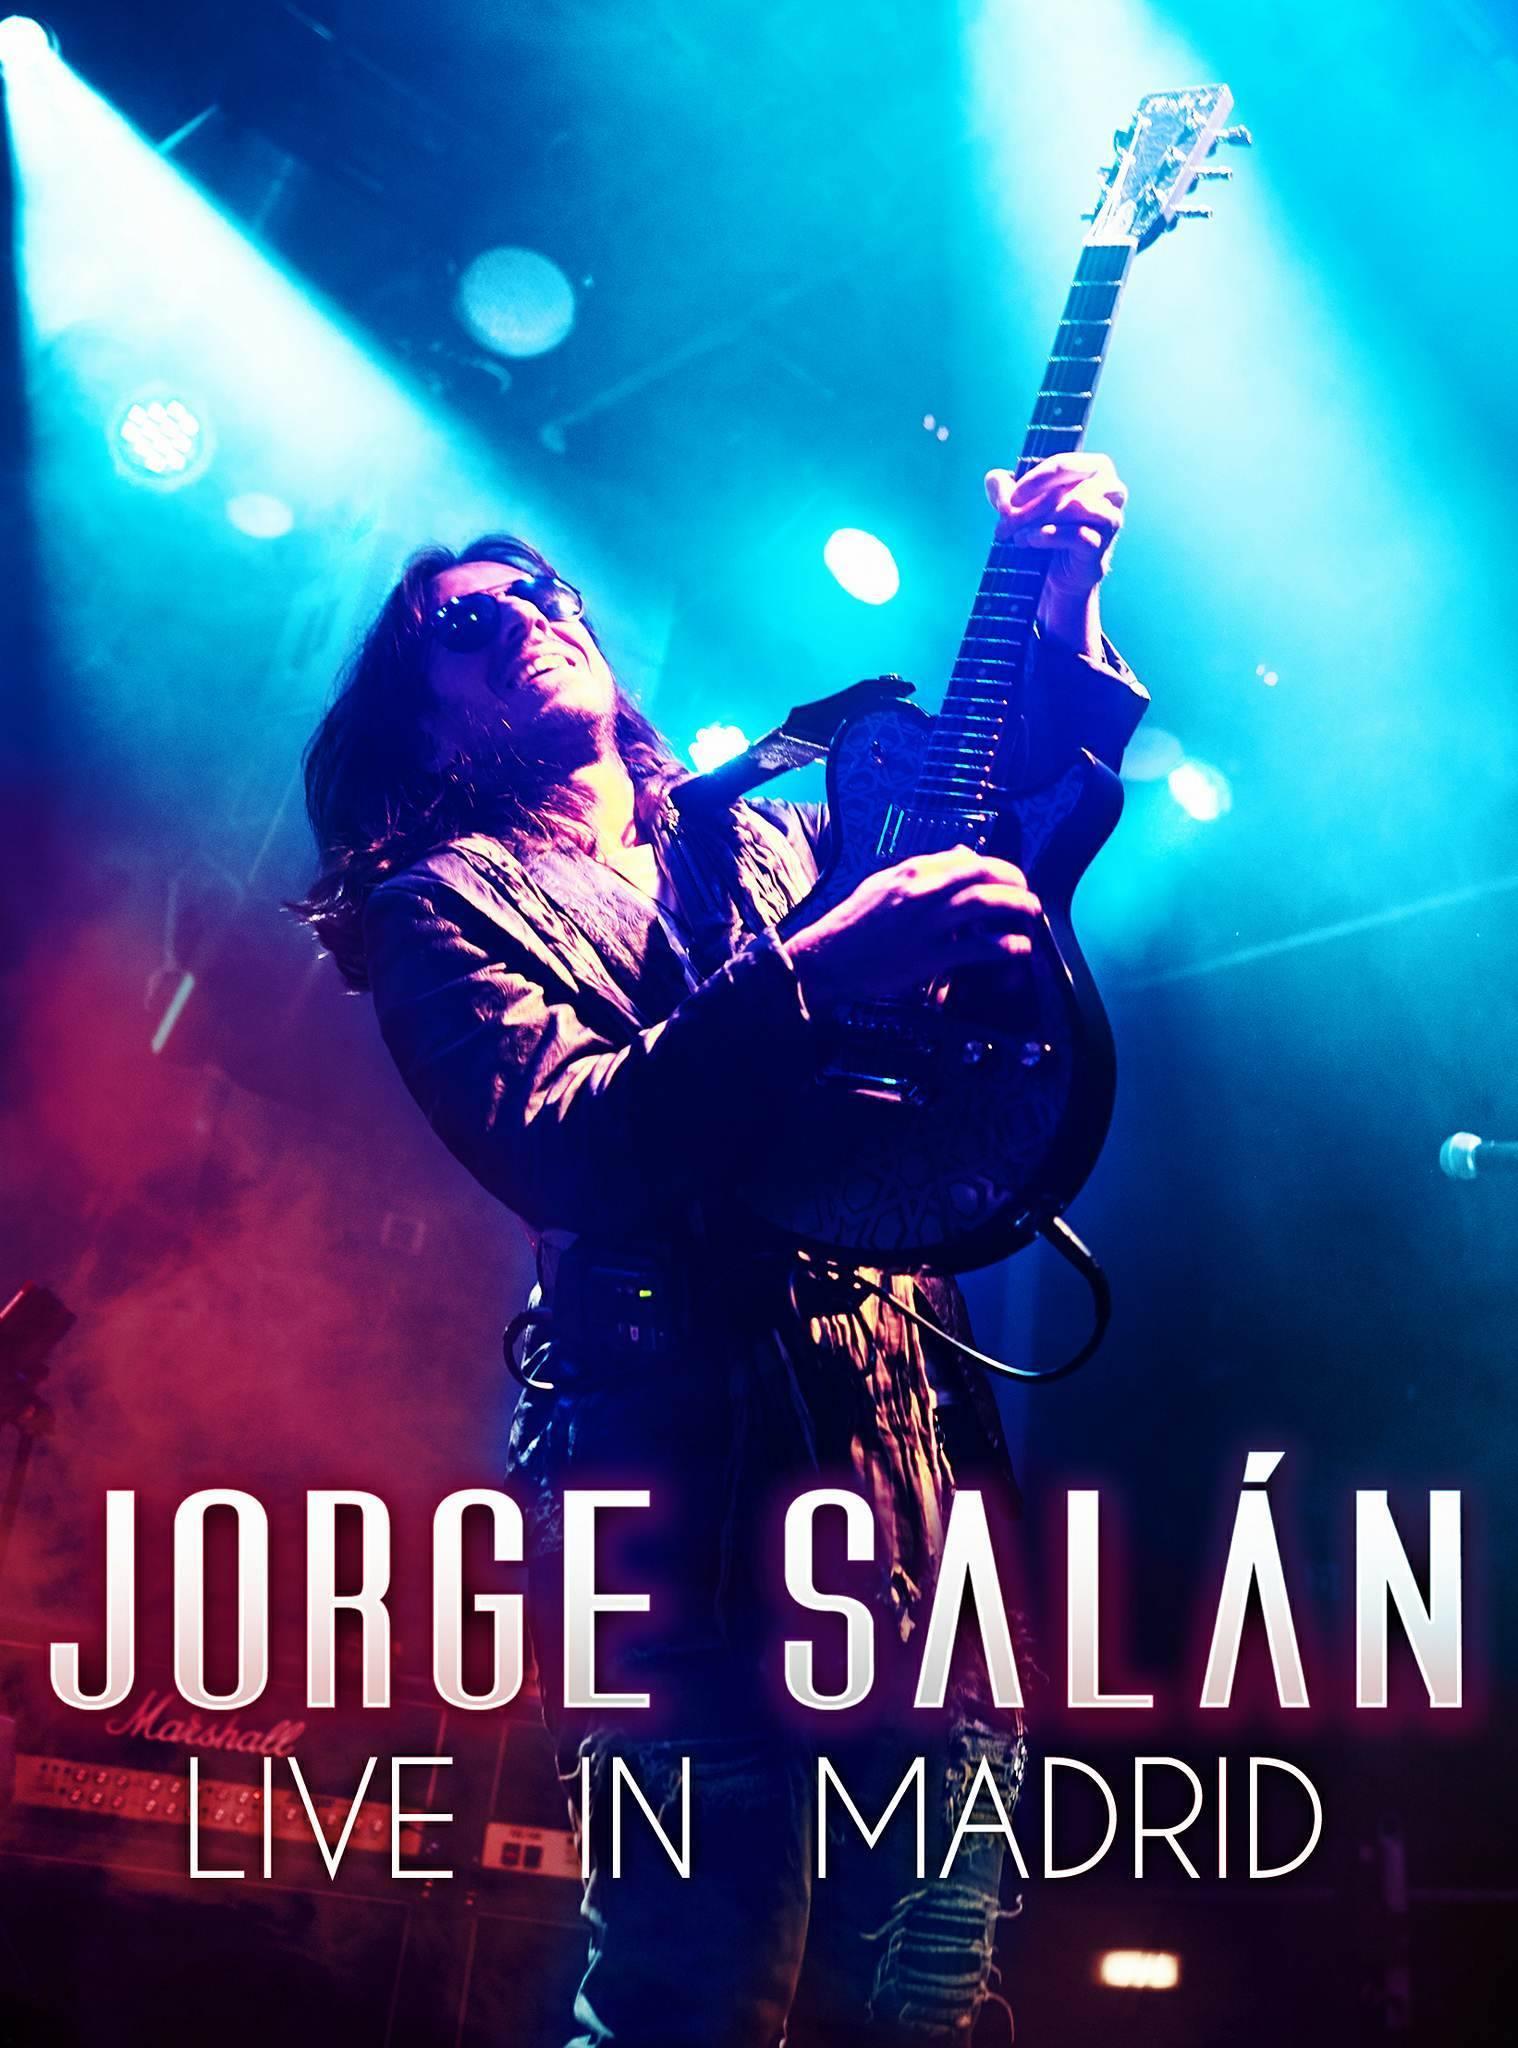 jorge salan - live in madrid